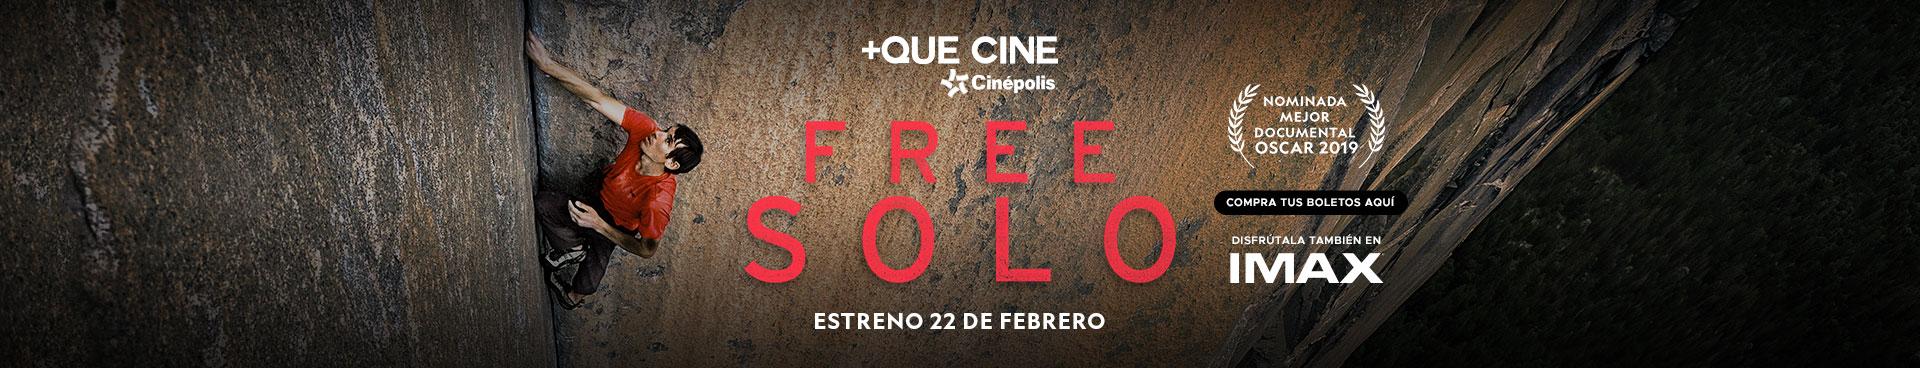 +Que Cine: Free Solo